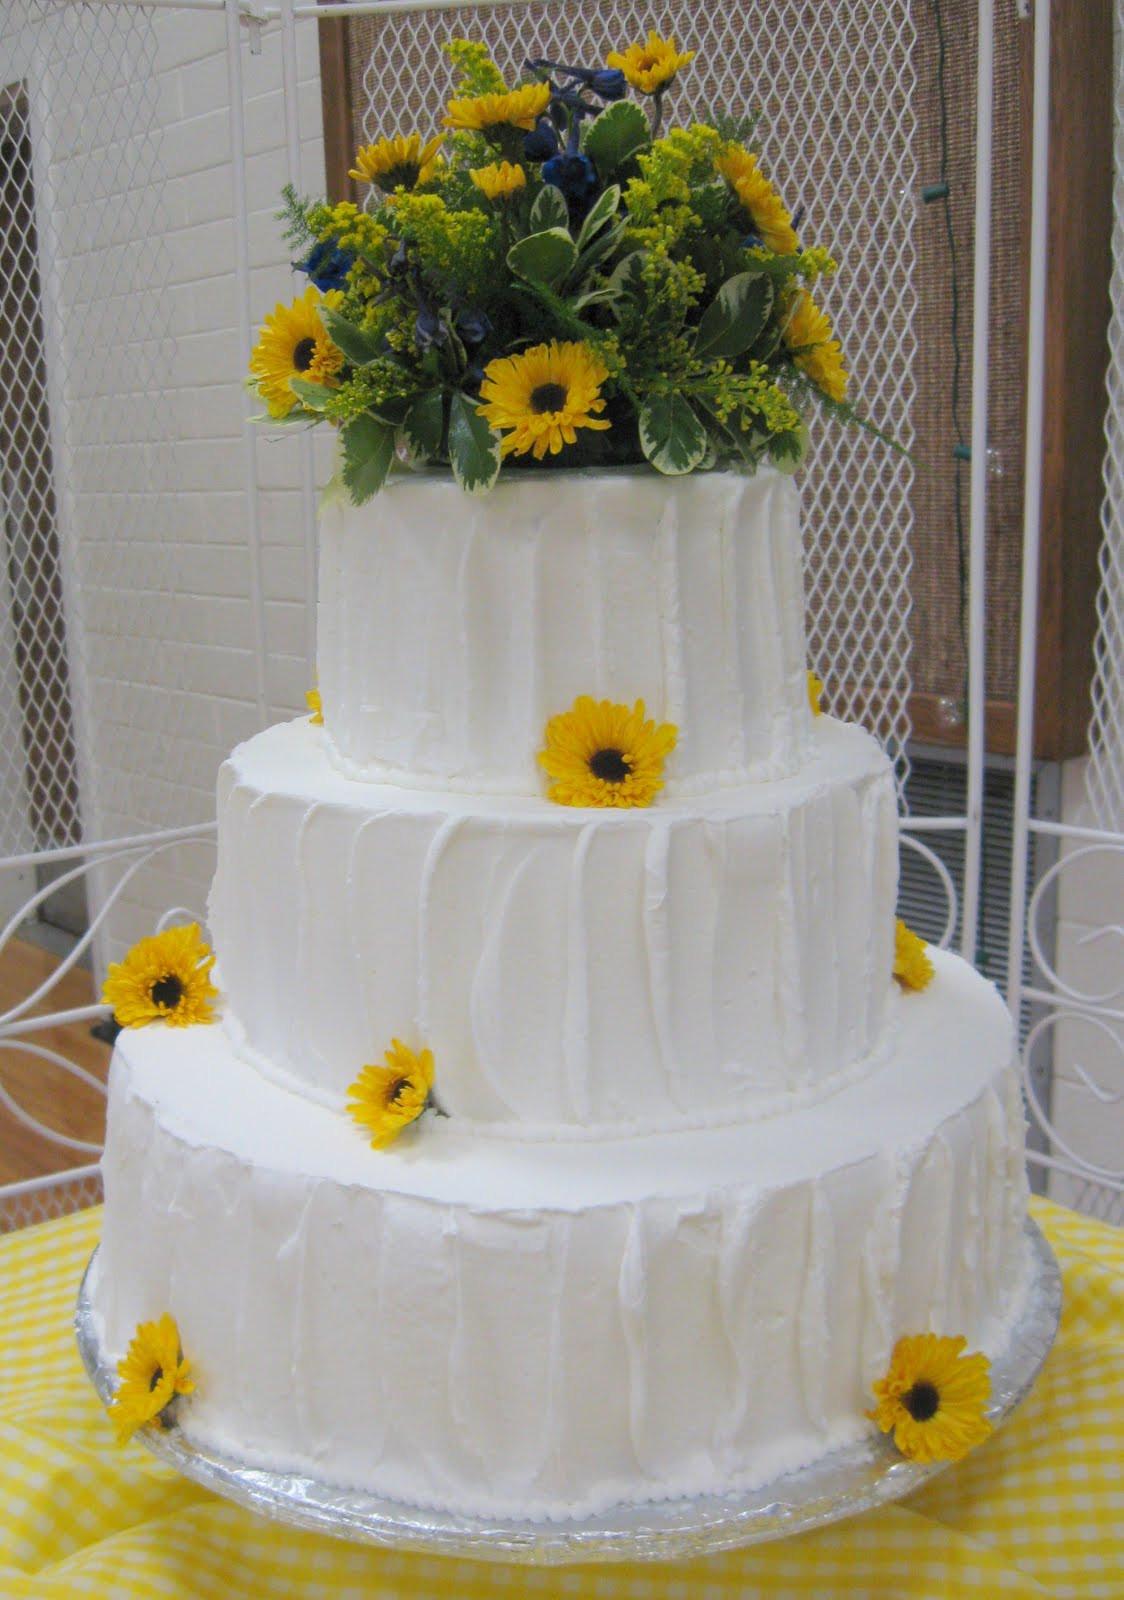 Country Style Wedding Cakes  ChubbyHubbyCakes Country style wedding cake